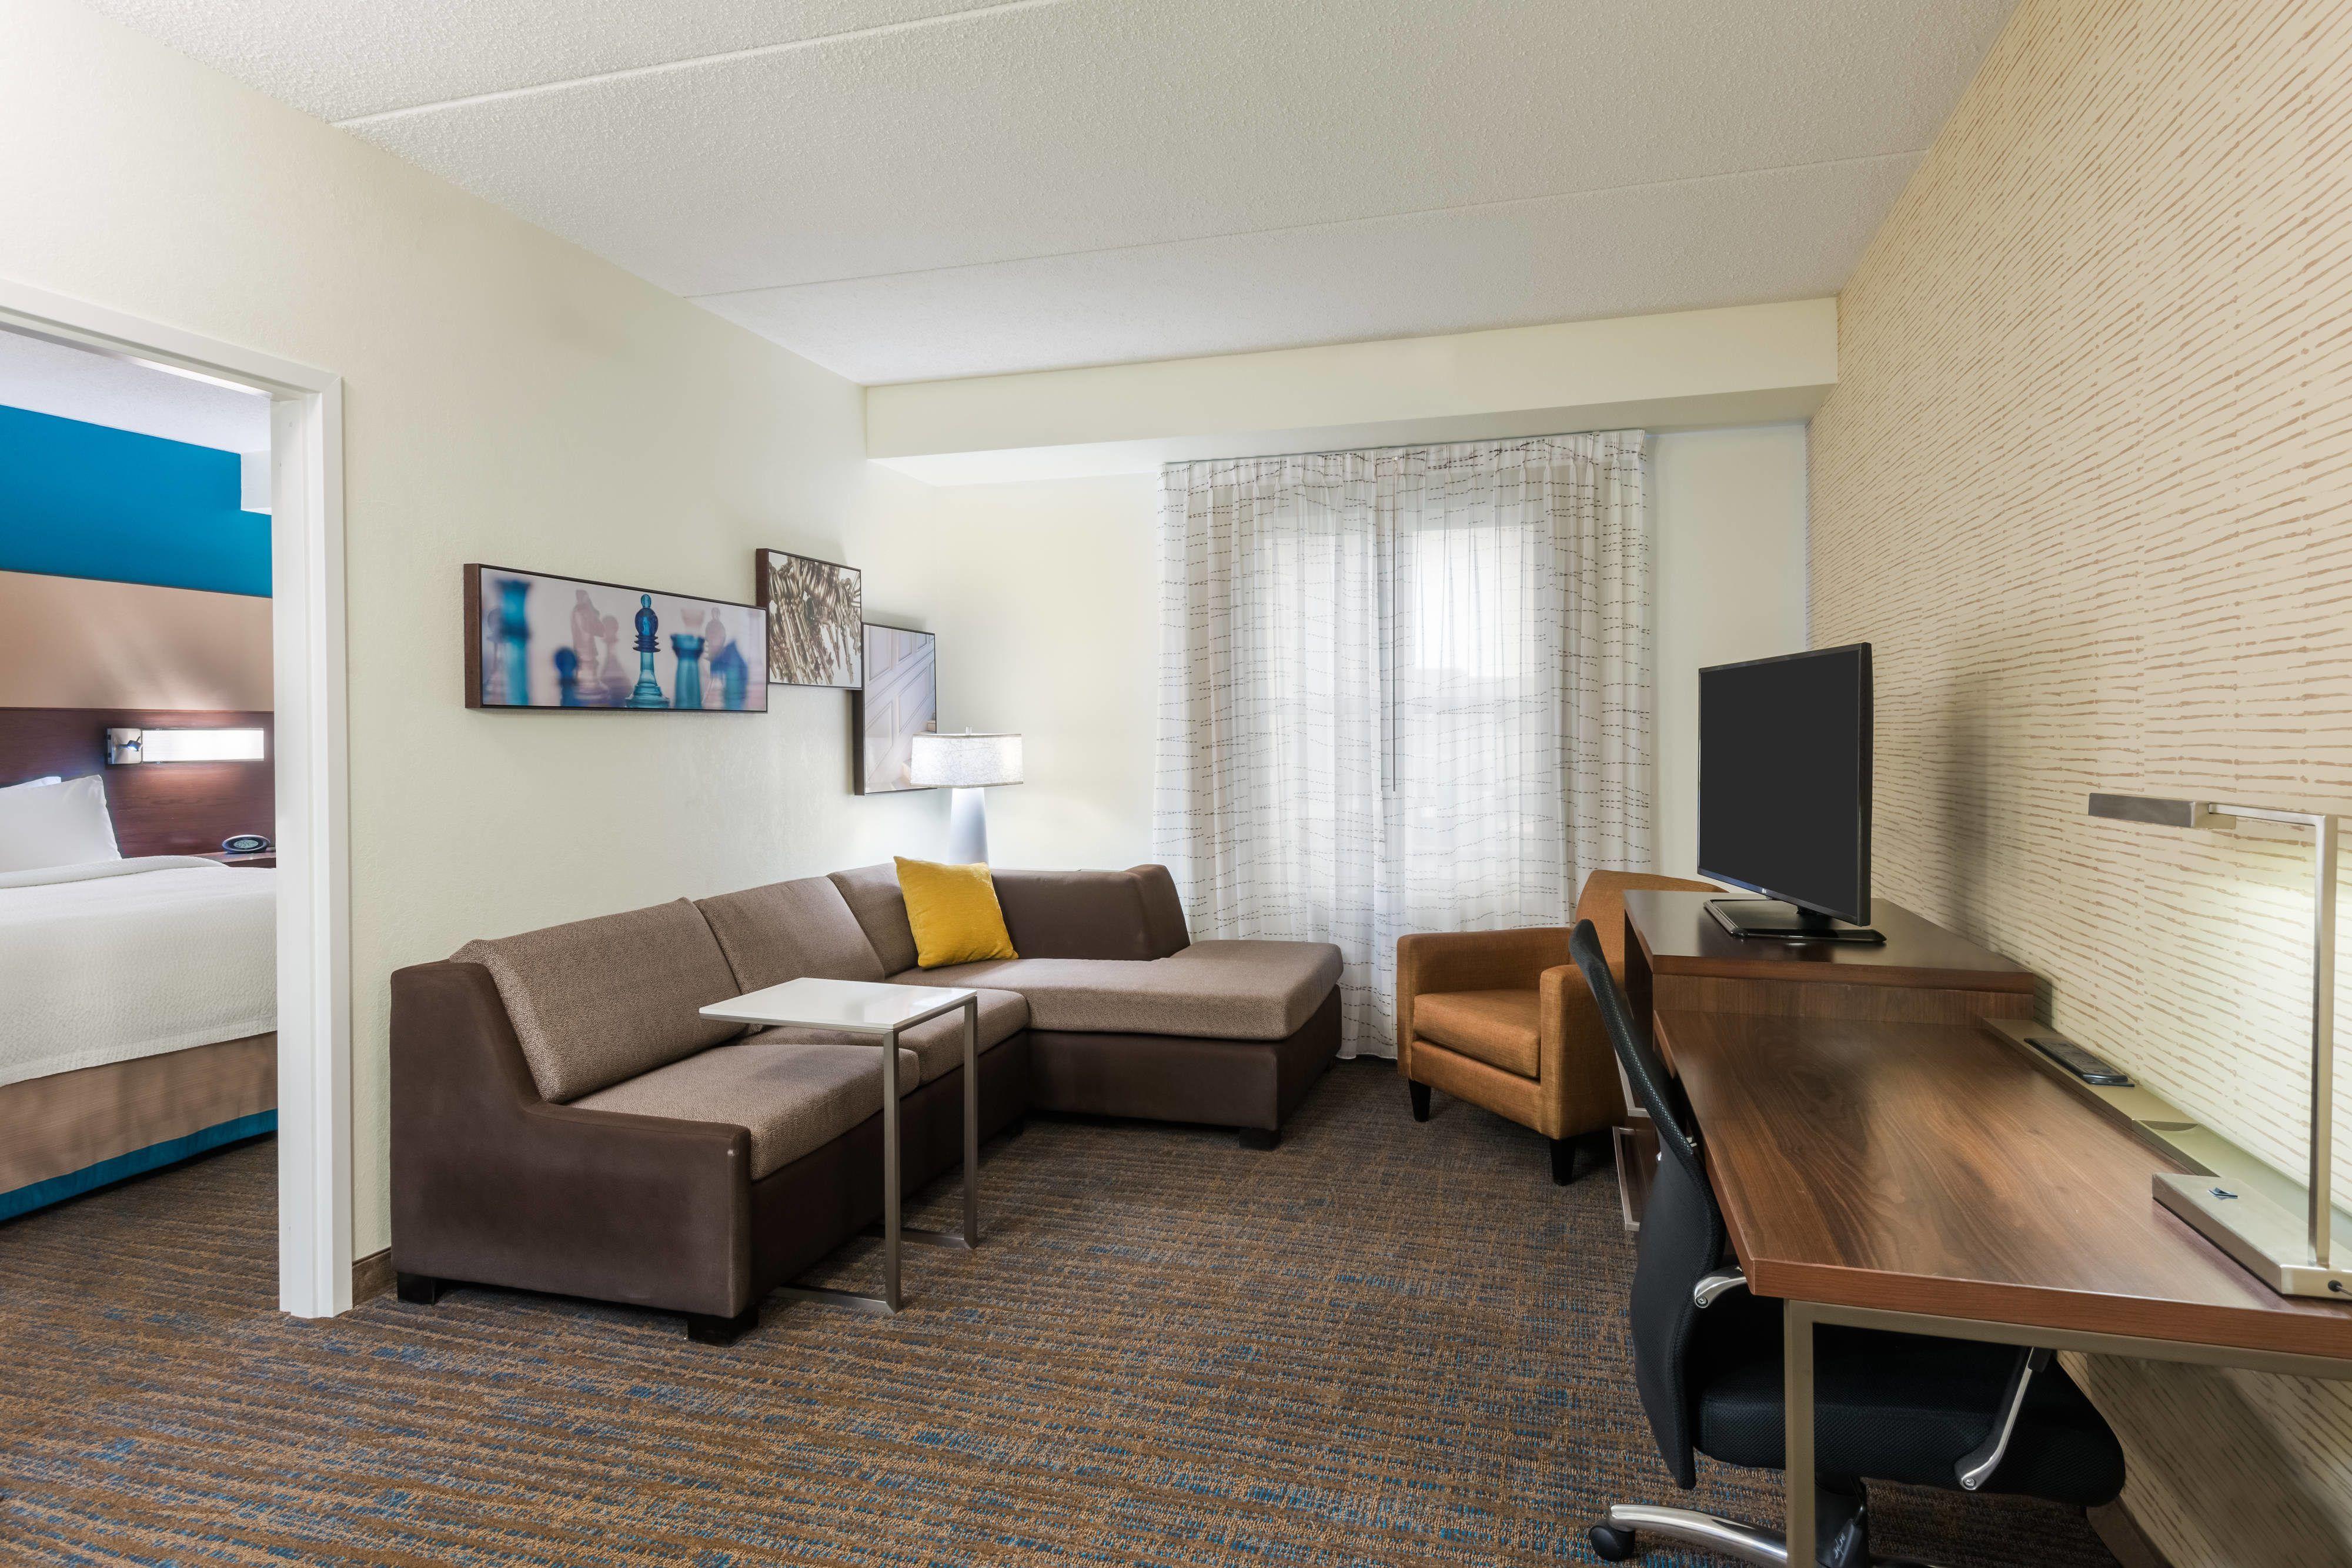 Hotels With 2 Bedroom Suites Near Me   Eqazadiv Home Design